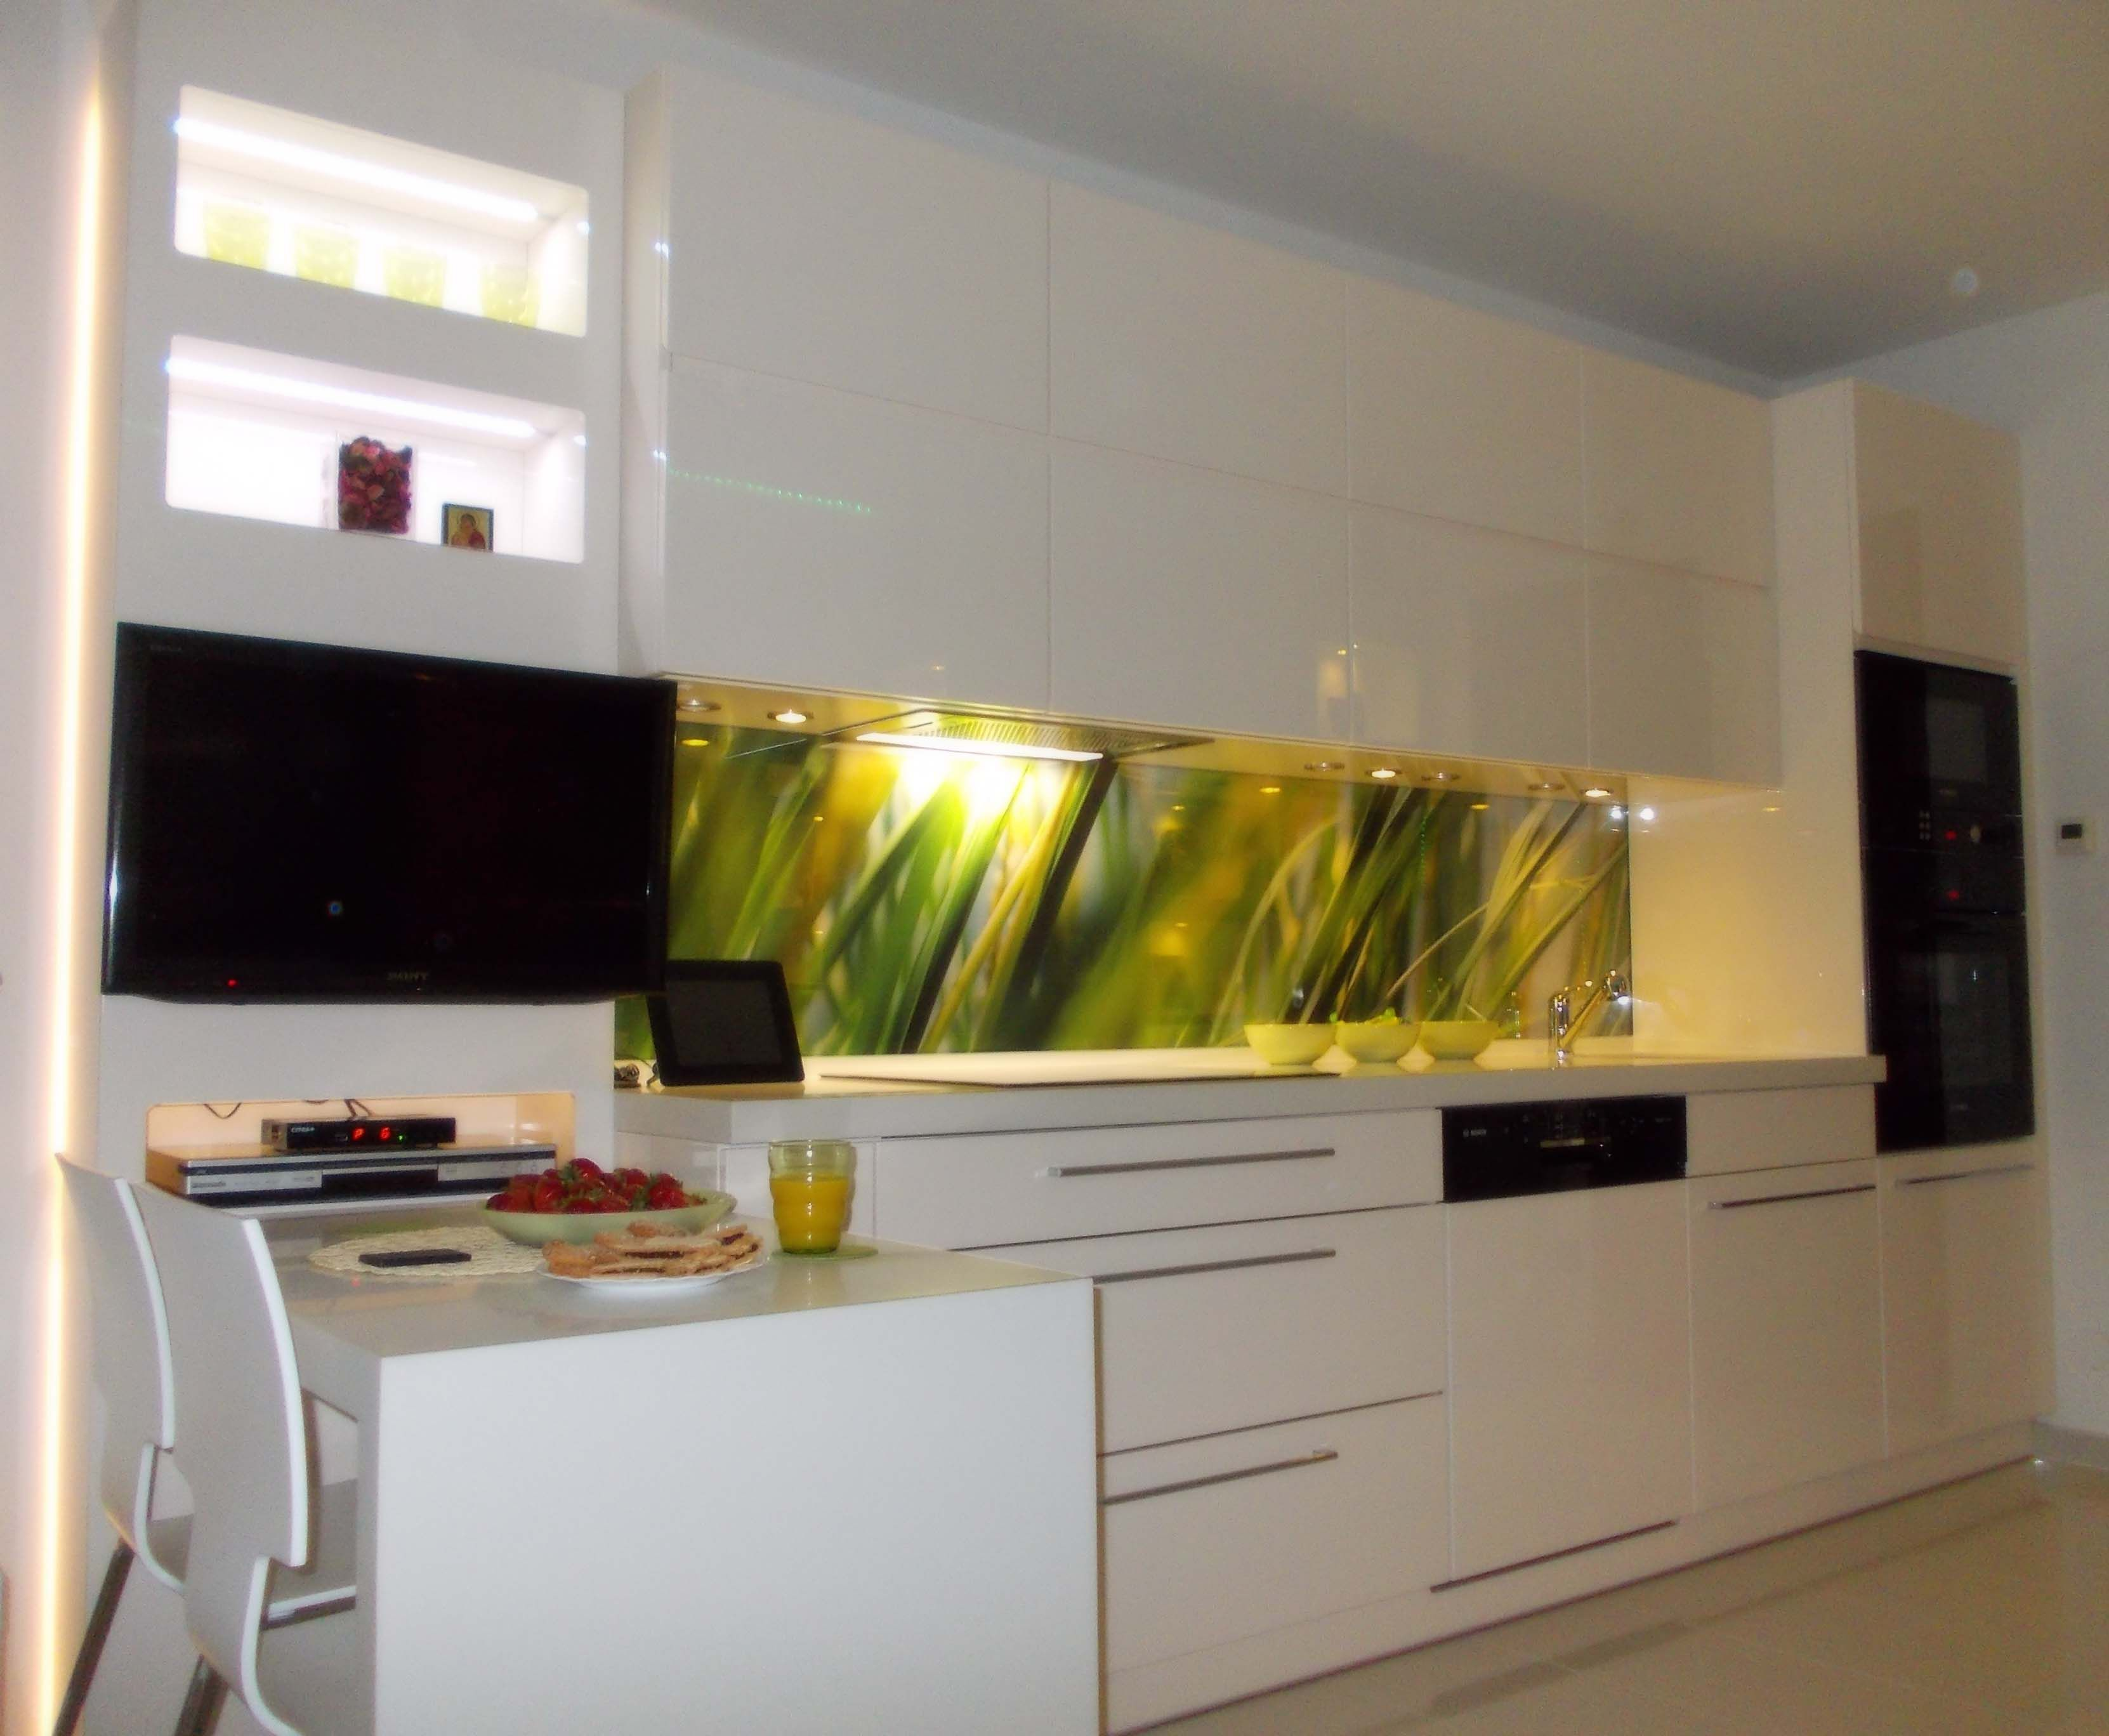 kuchnia przechodnia  Interior design  Pinterest  Interiors -> Male Kuchnie W Bloku Aranzacje